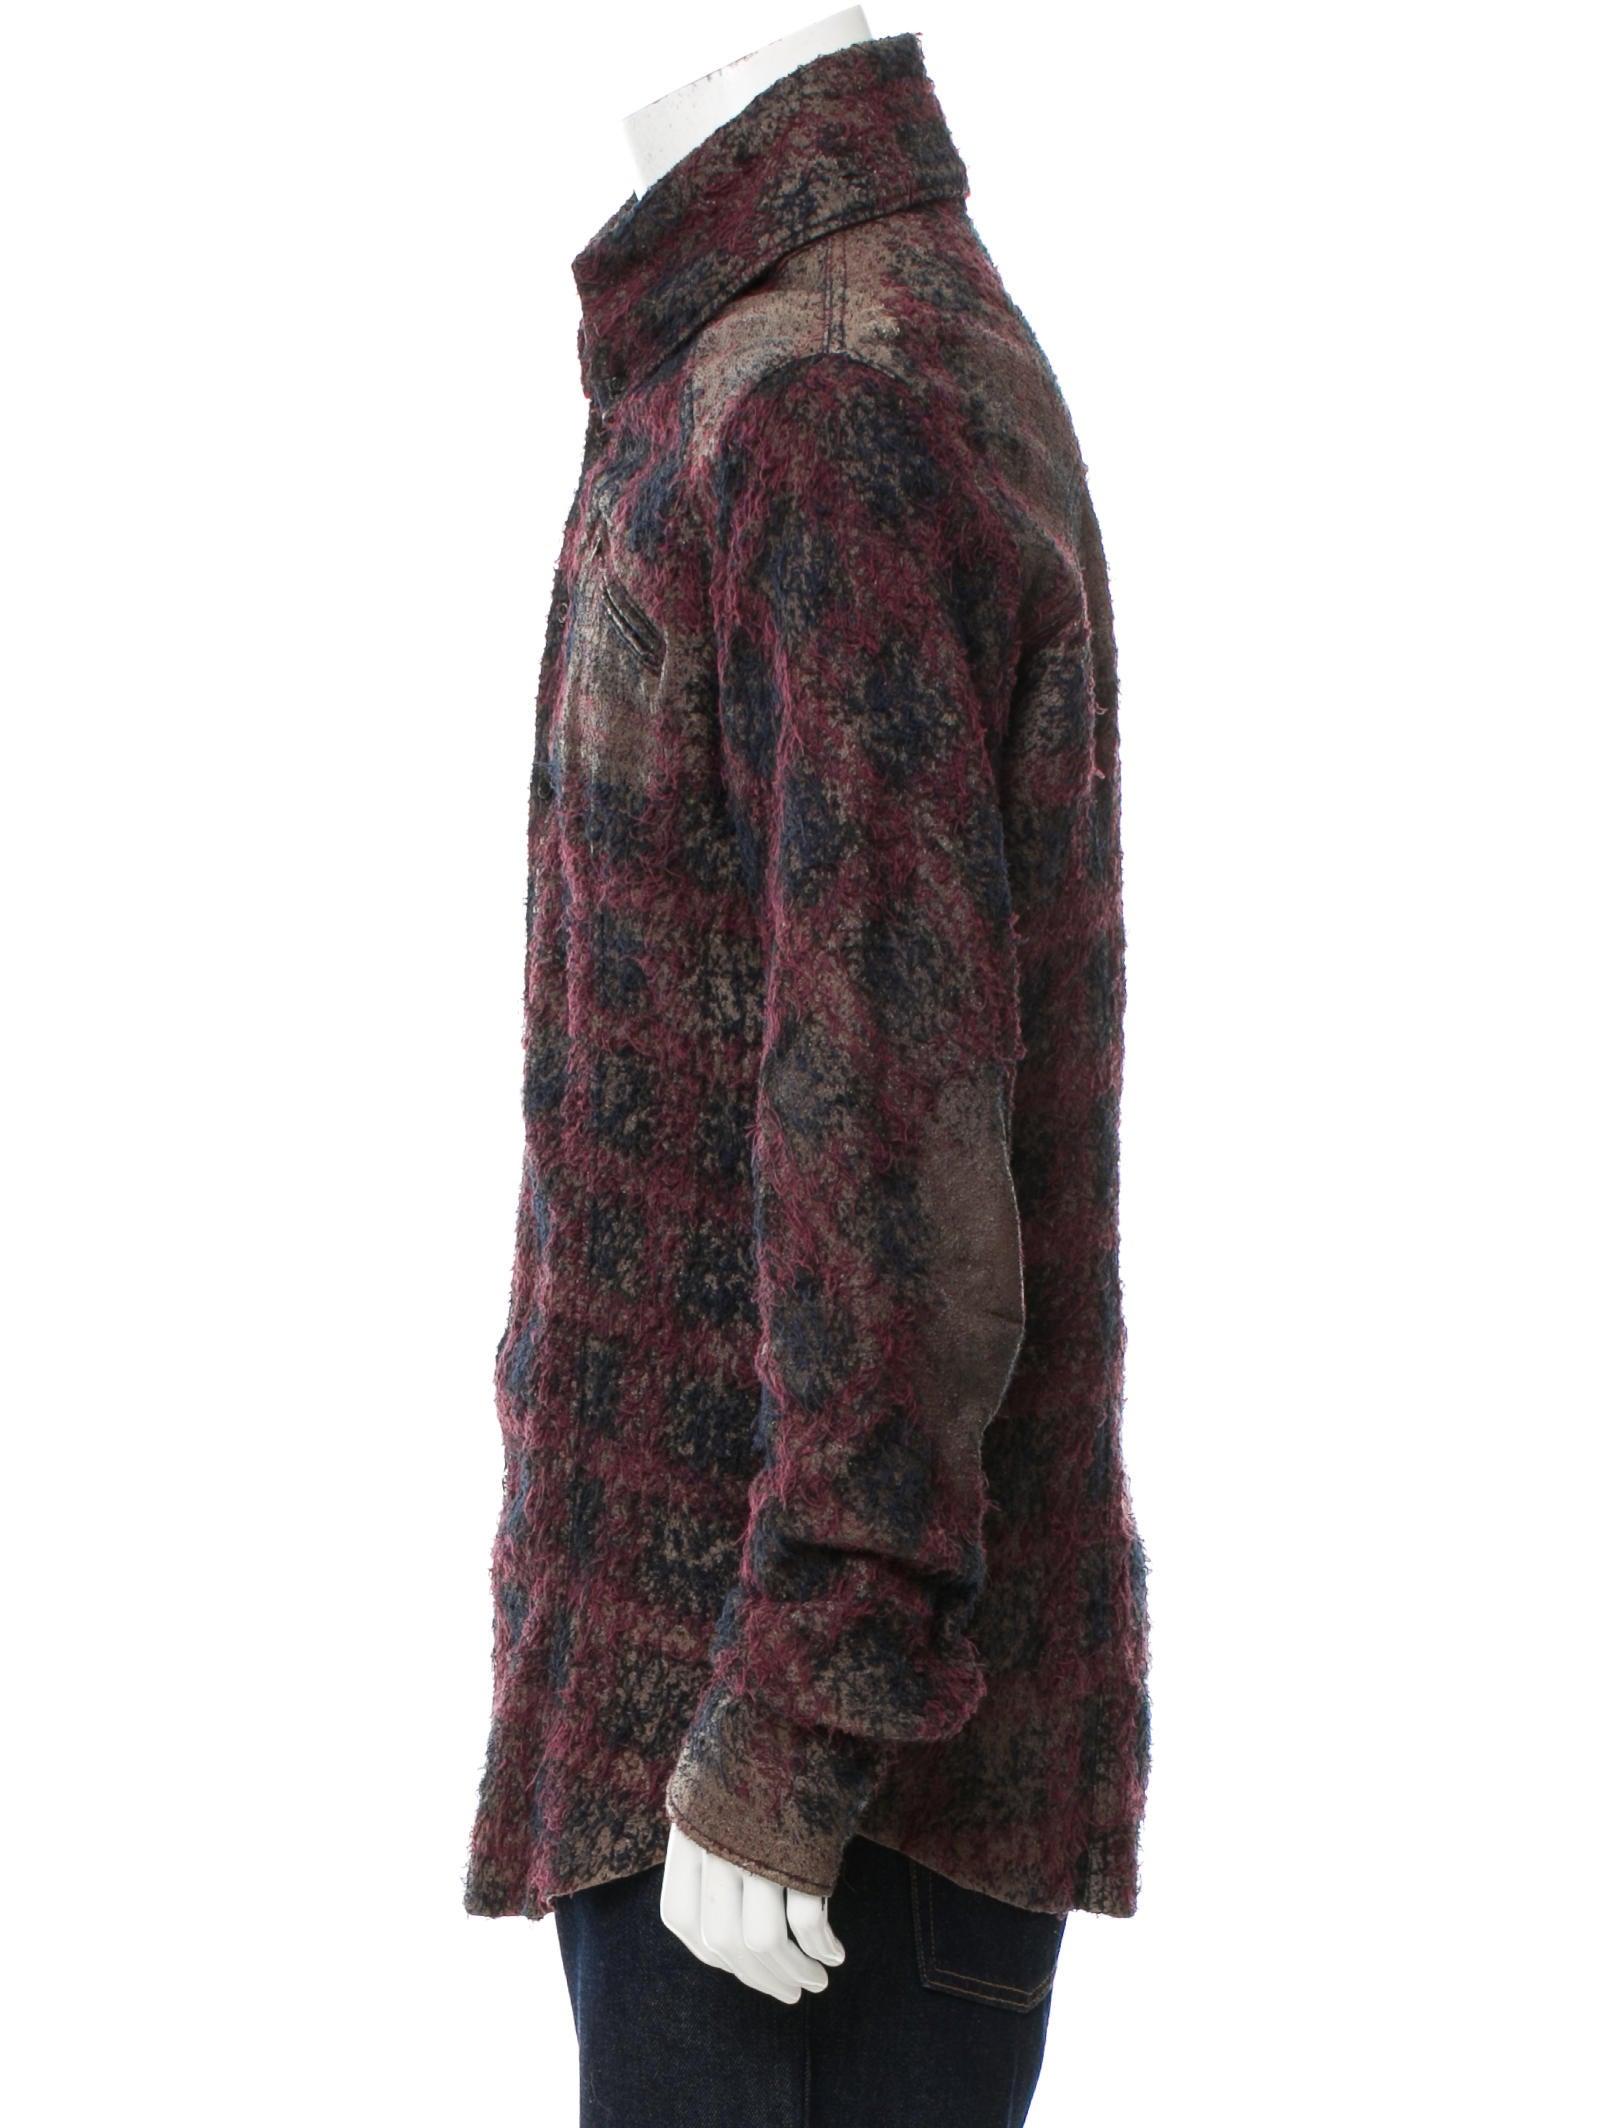 Lgb leather plaid lined shirt jacket clothing for Plaid shirt jacket mens